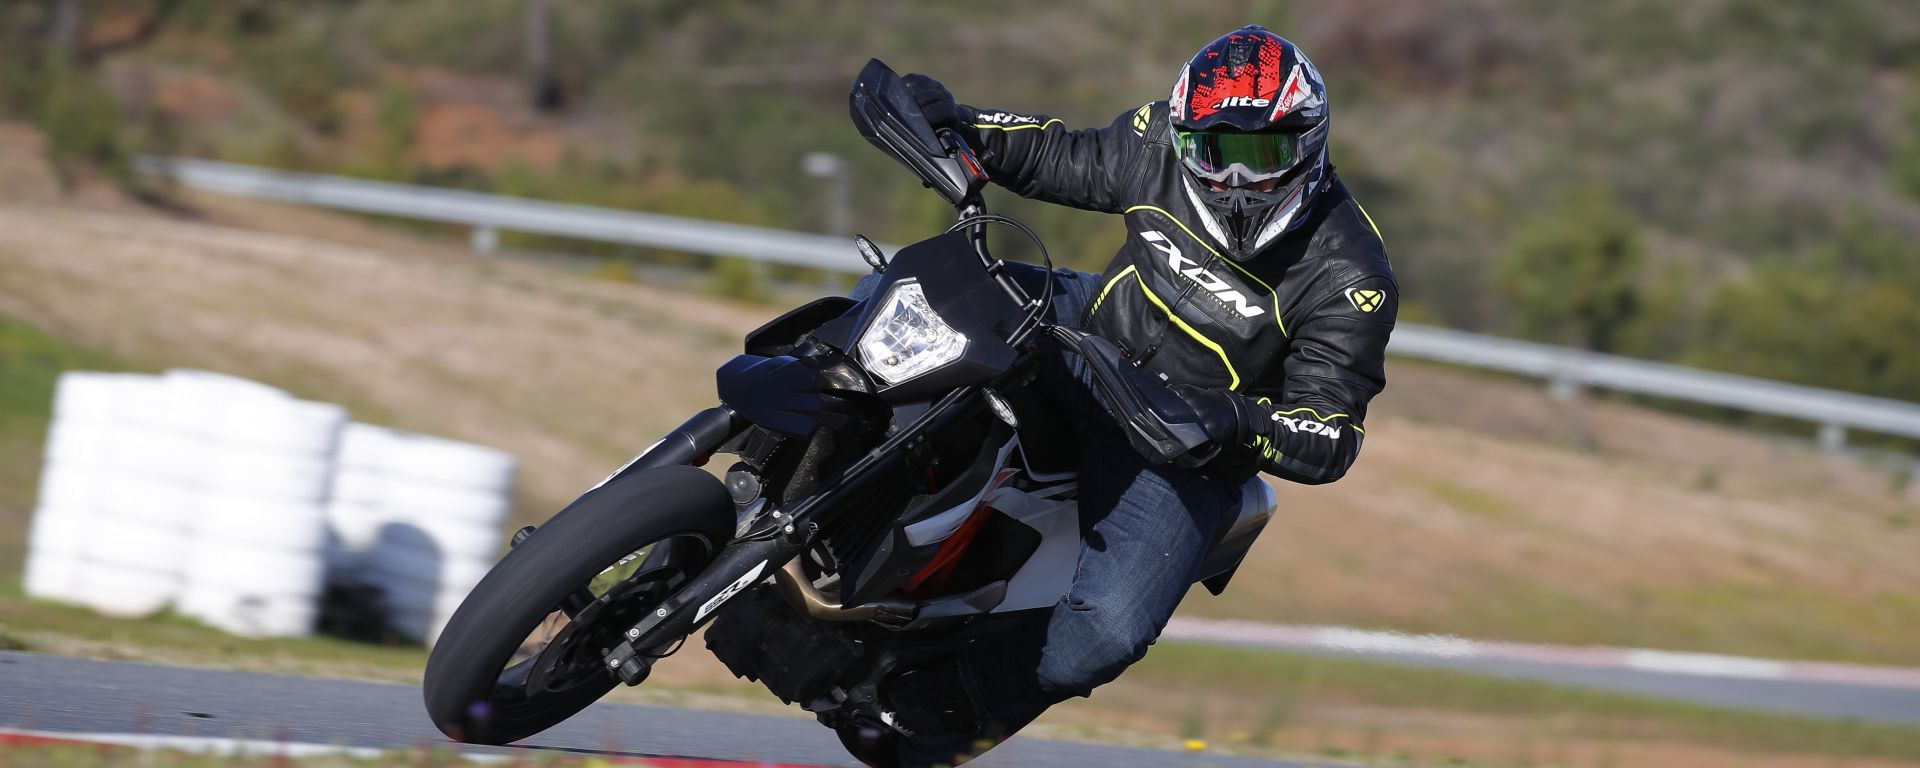 KTM 690 SMC R 2019: torna il motard austriaco. Prova su strada